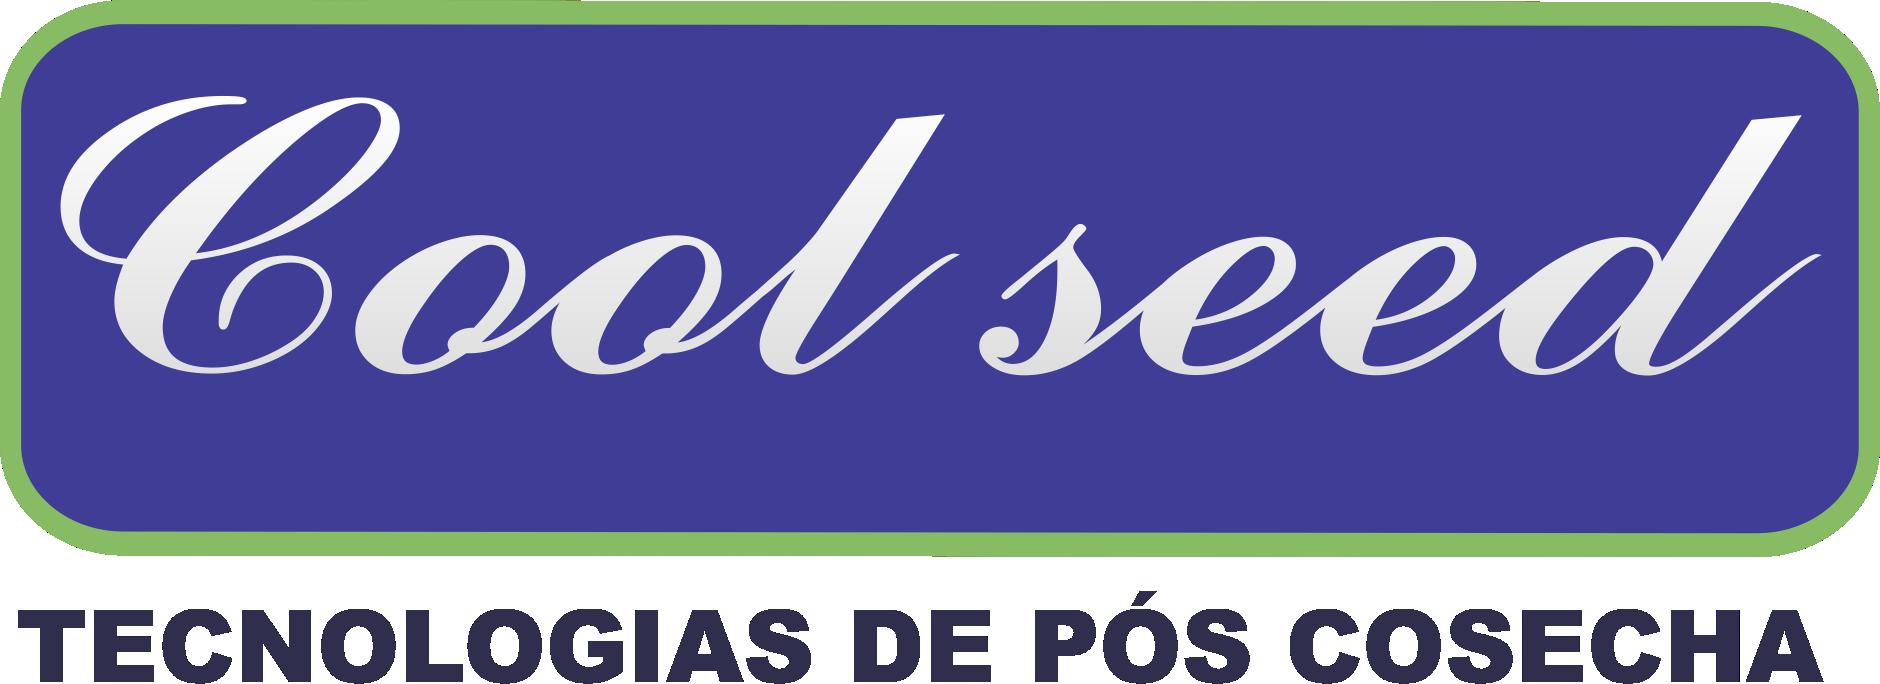 LOGO CDR - Es..png